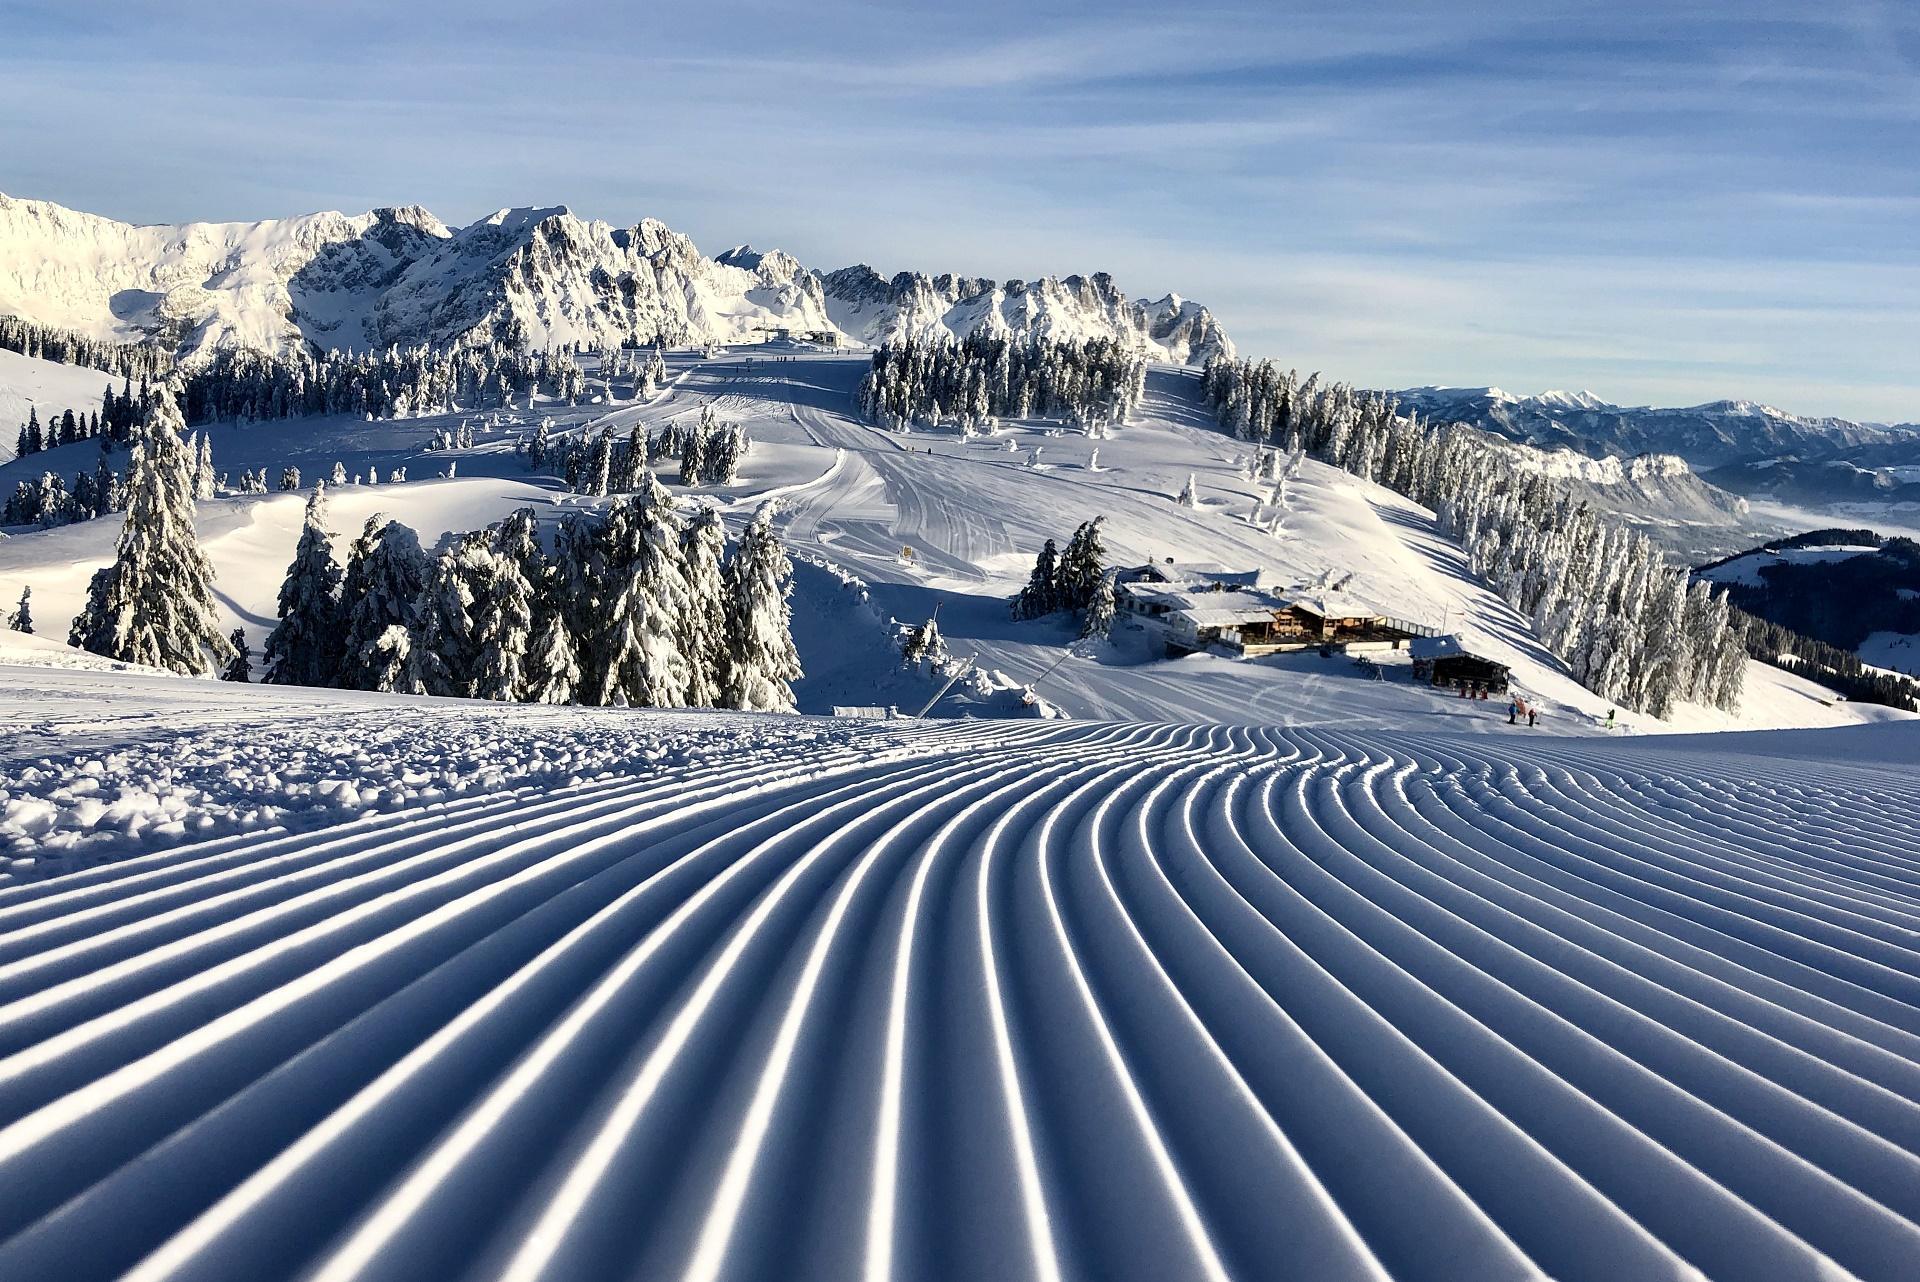 Tennenwirt Guesthouse #Willkommen#Bildergalerie#Region#Winter